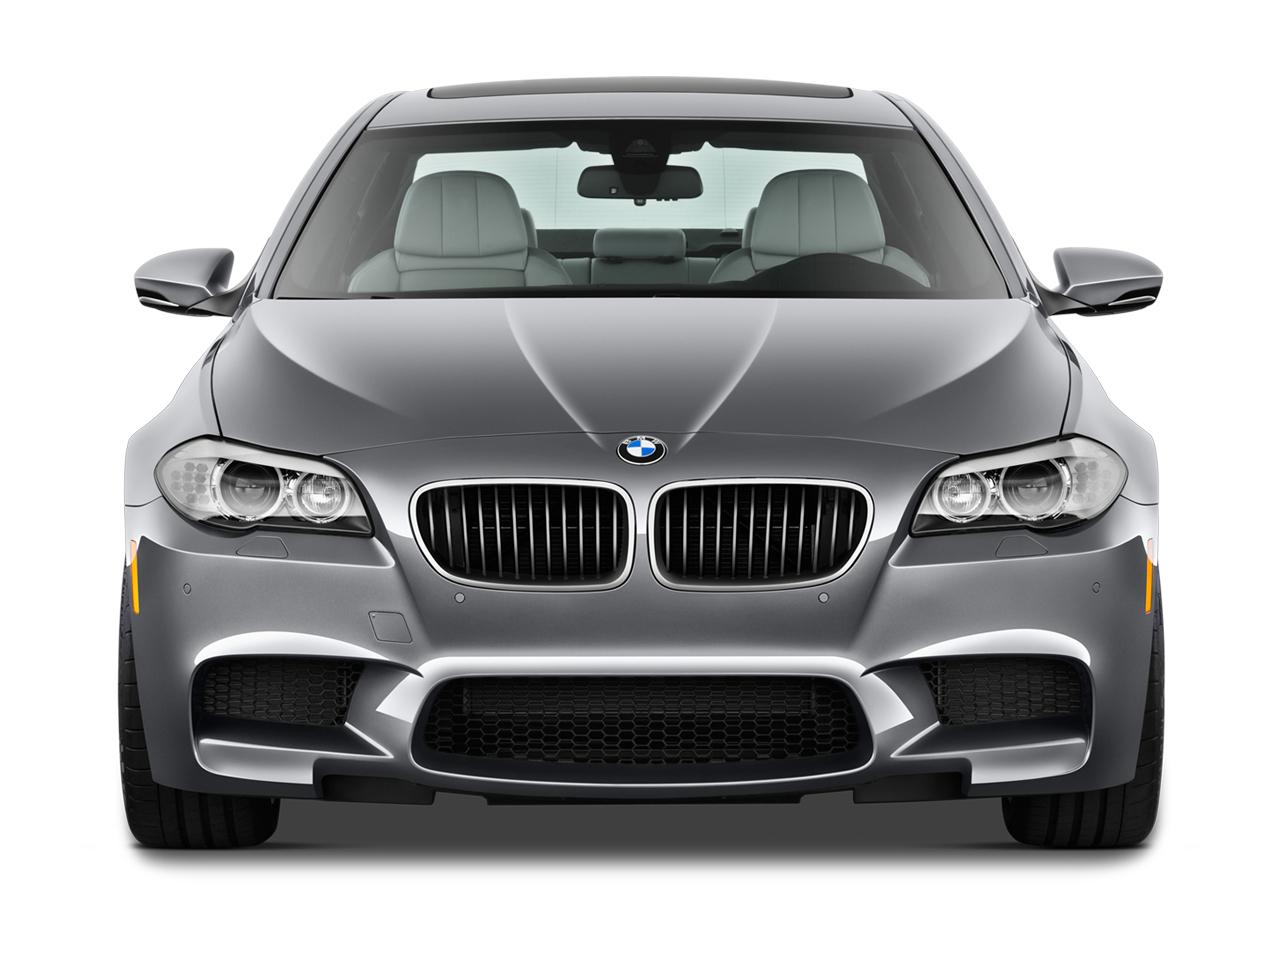 car pictures list for bmw m5 sedan 2017 4 4t qatar yallamotor. Black Bedroom Furniture Sets. Home Design Ideas